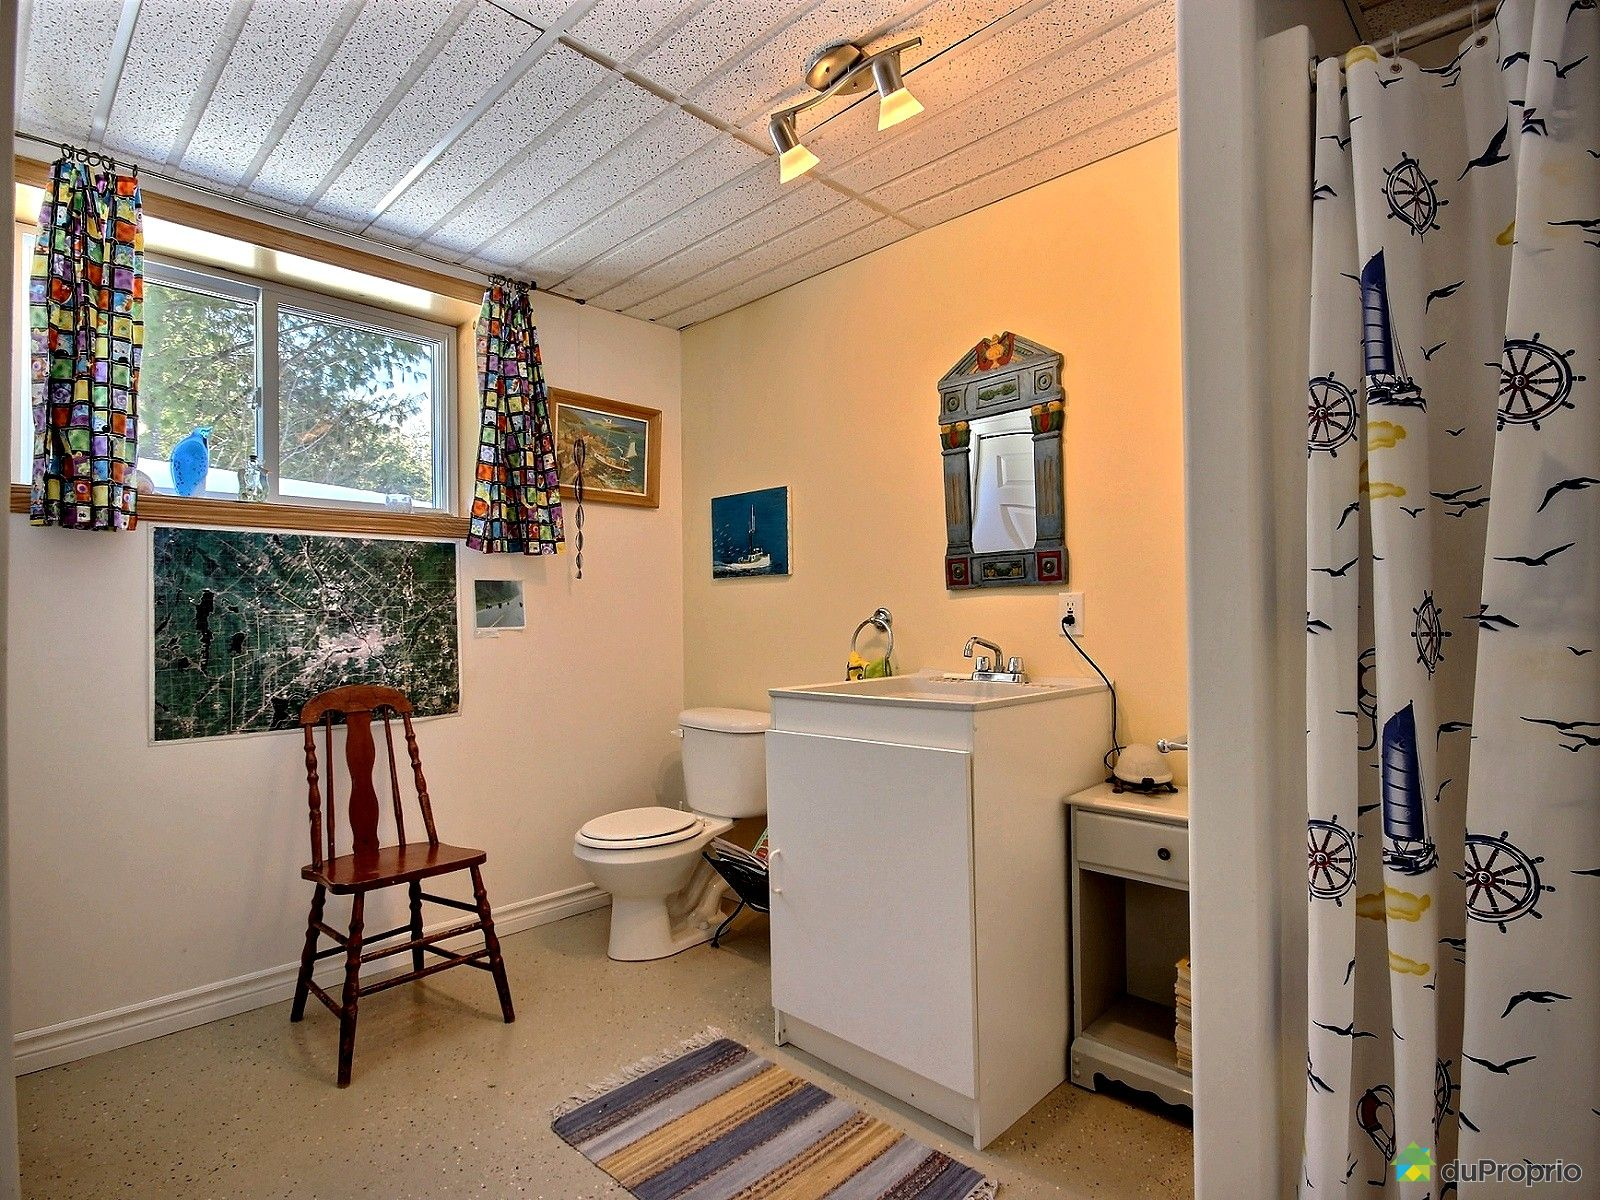 Maison vendu st fran ois xavier de brompton immobilier for Salle de bain xavier laurent